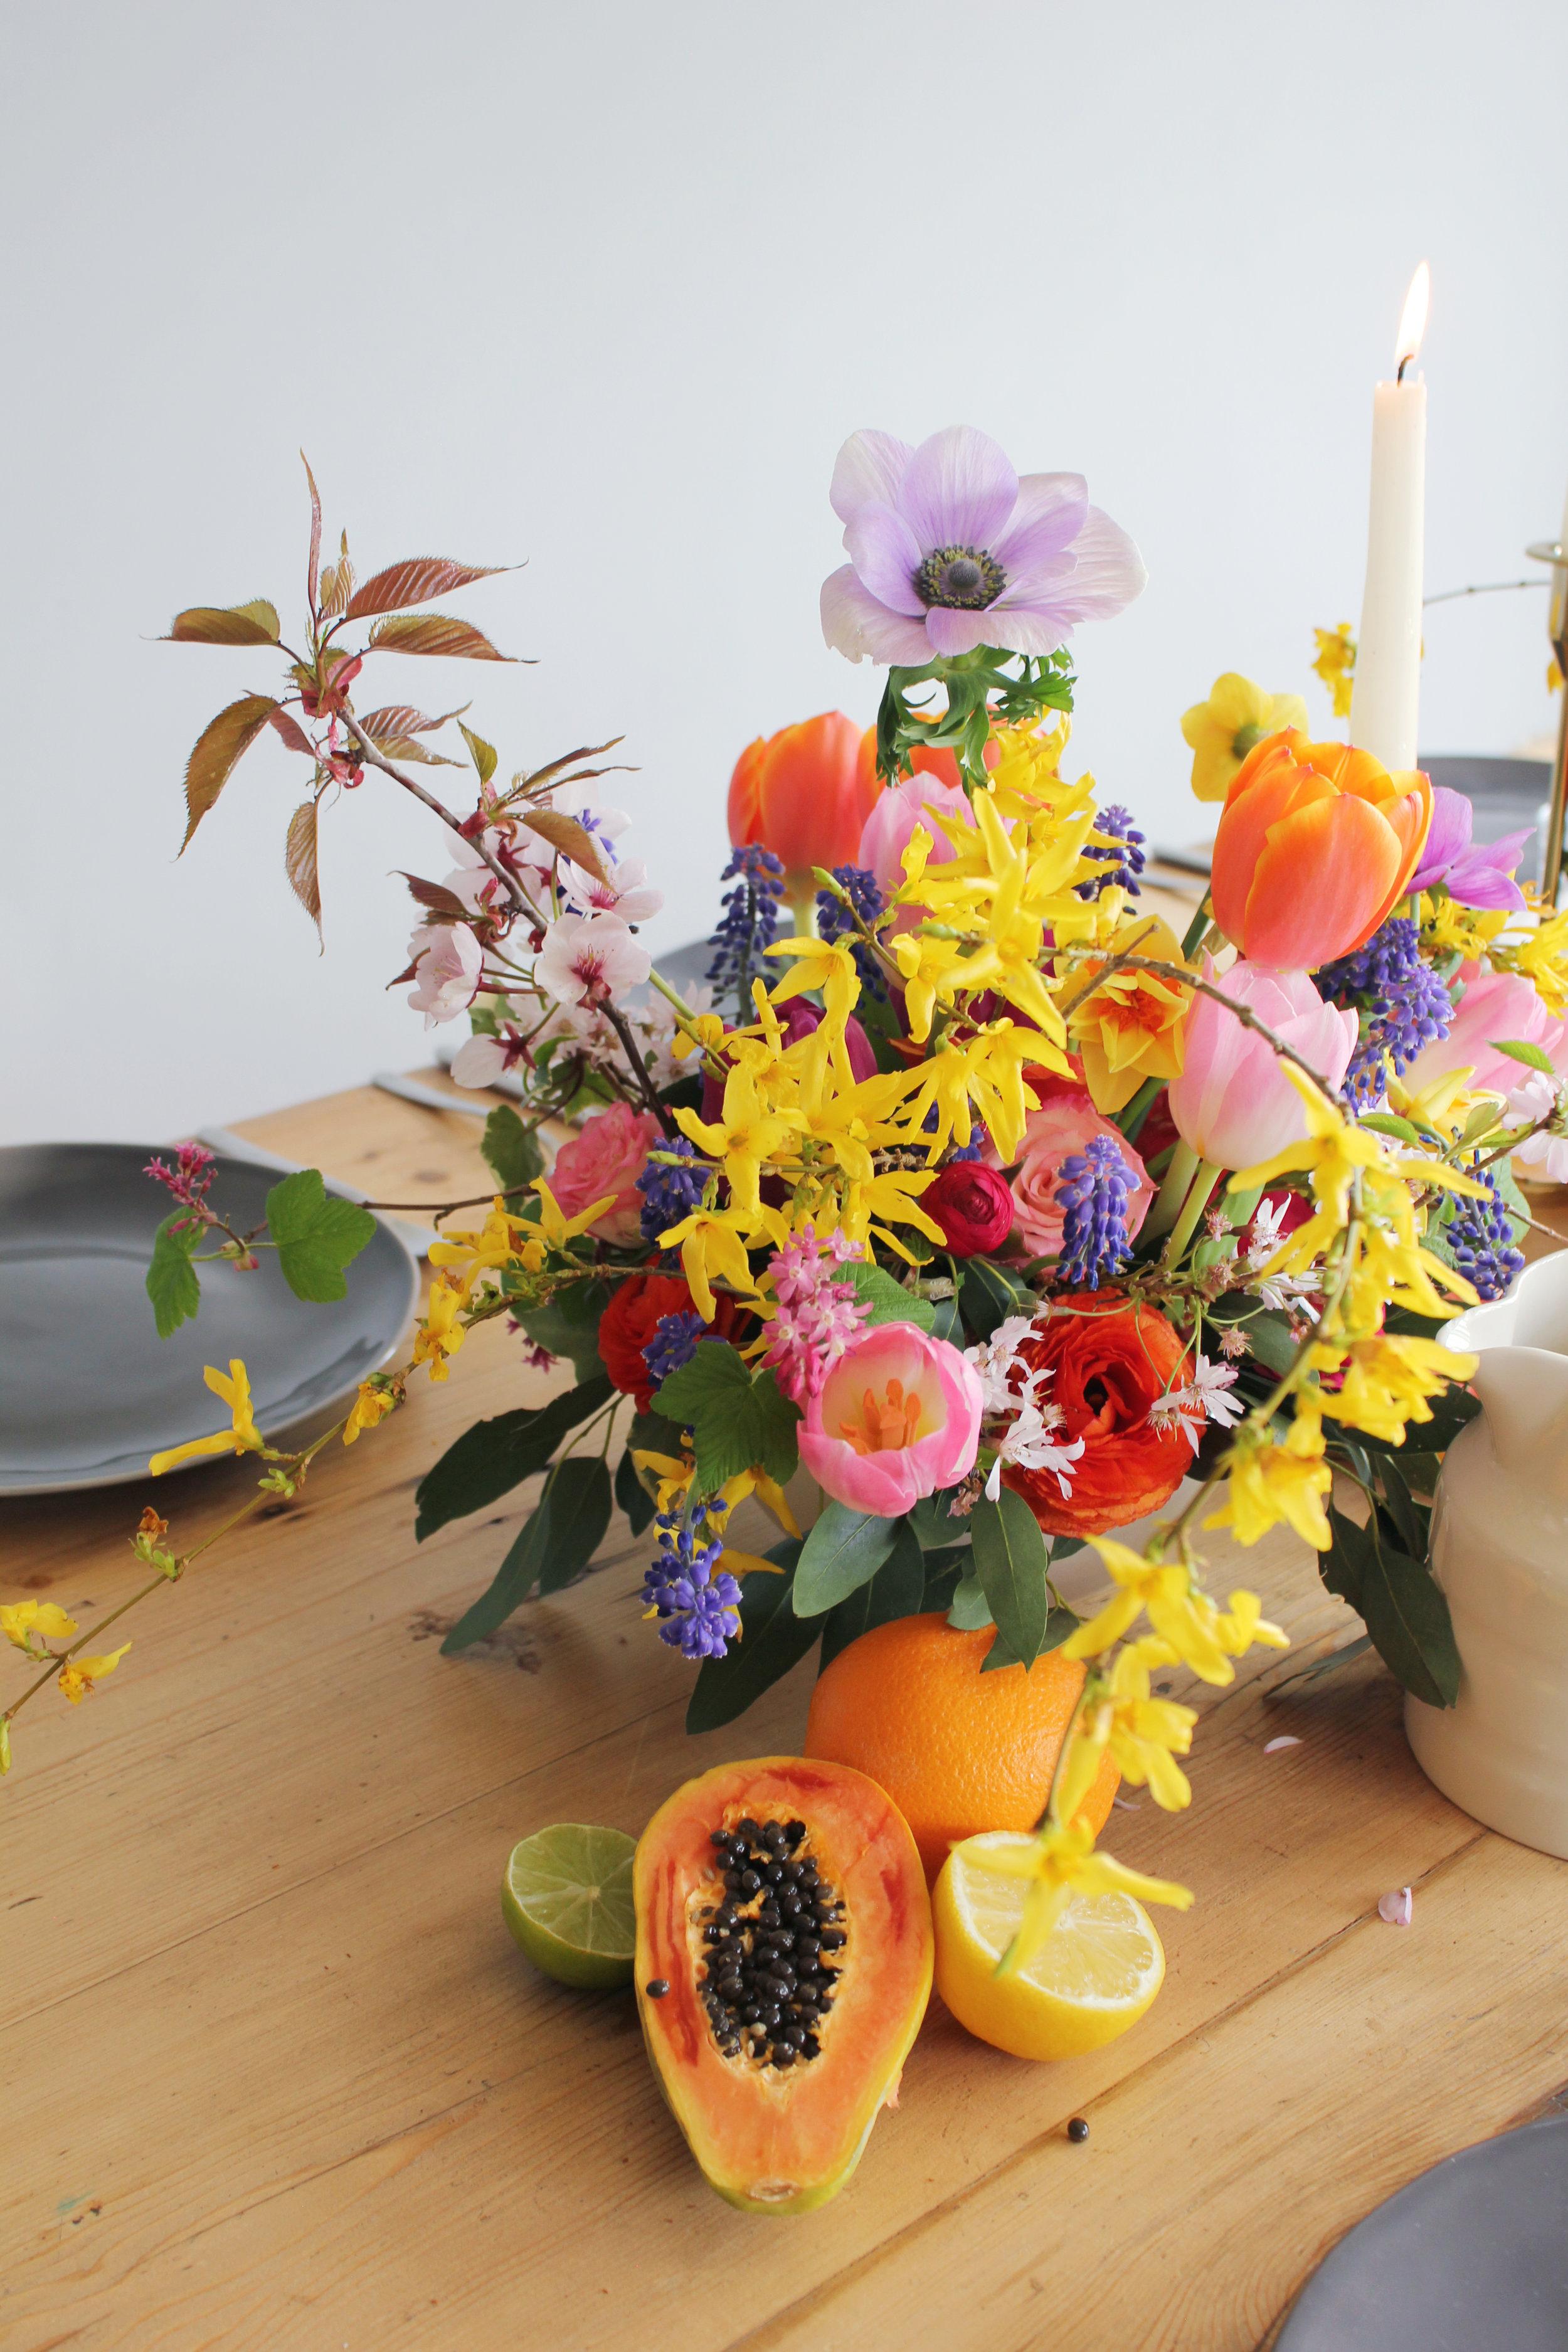 Callie-Pettigrew-Fruity-Florals-22.jpg